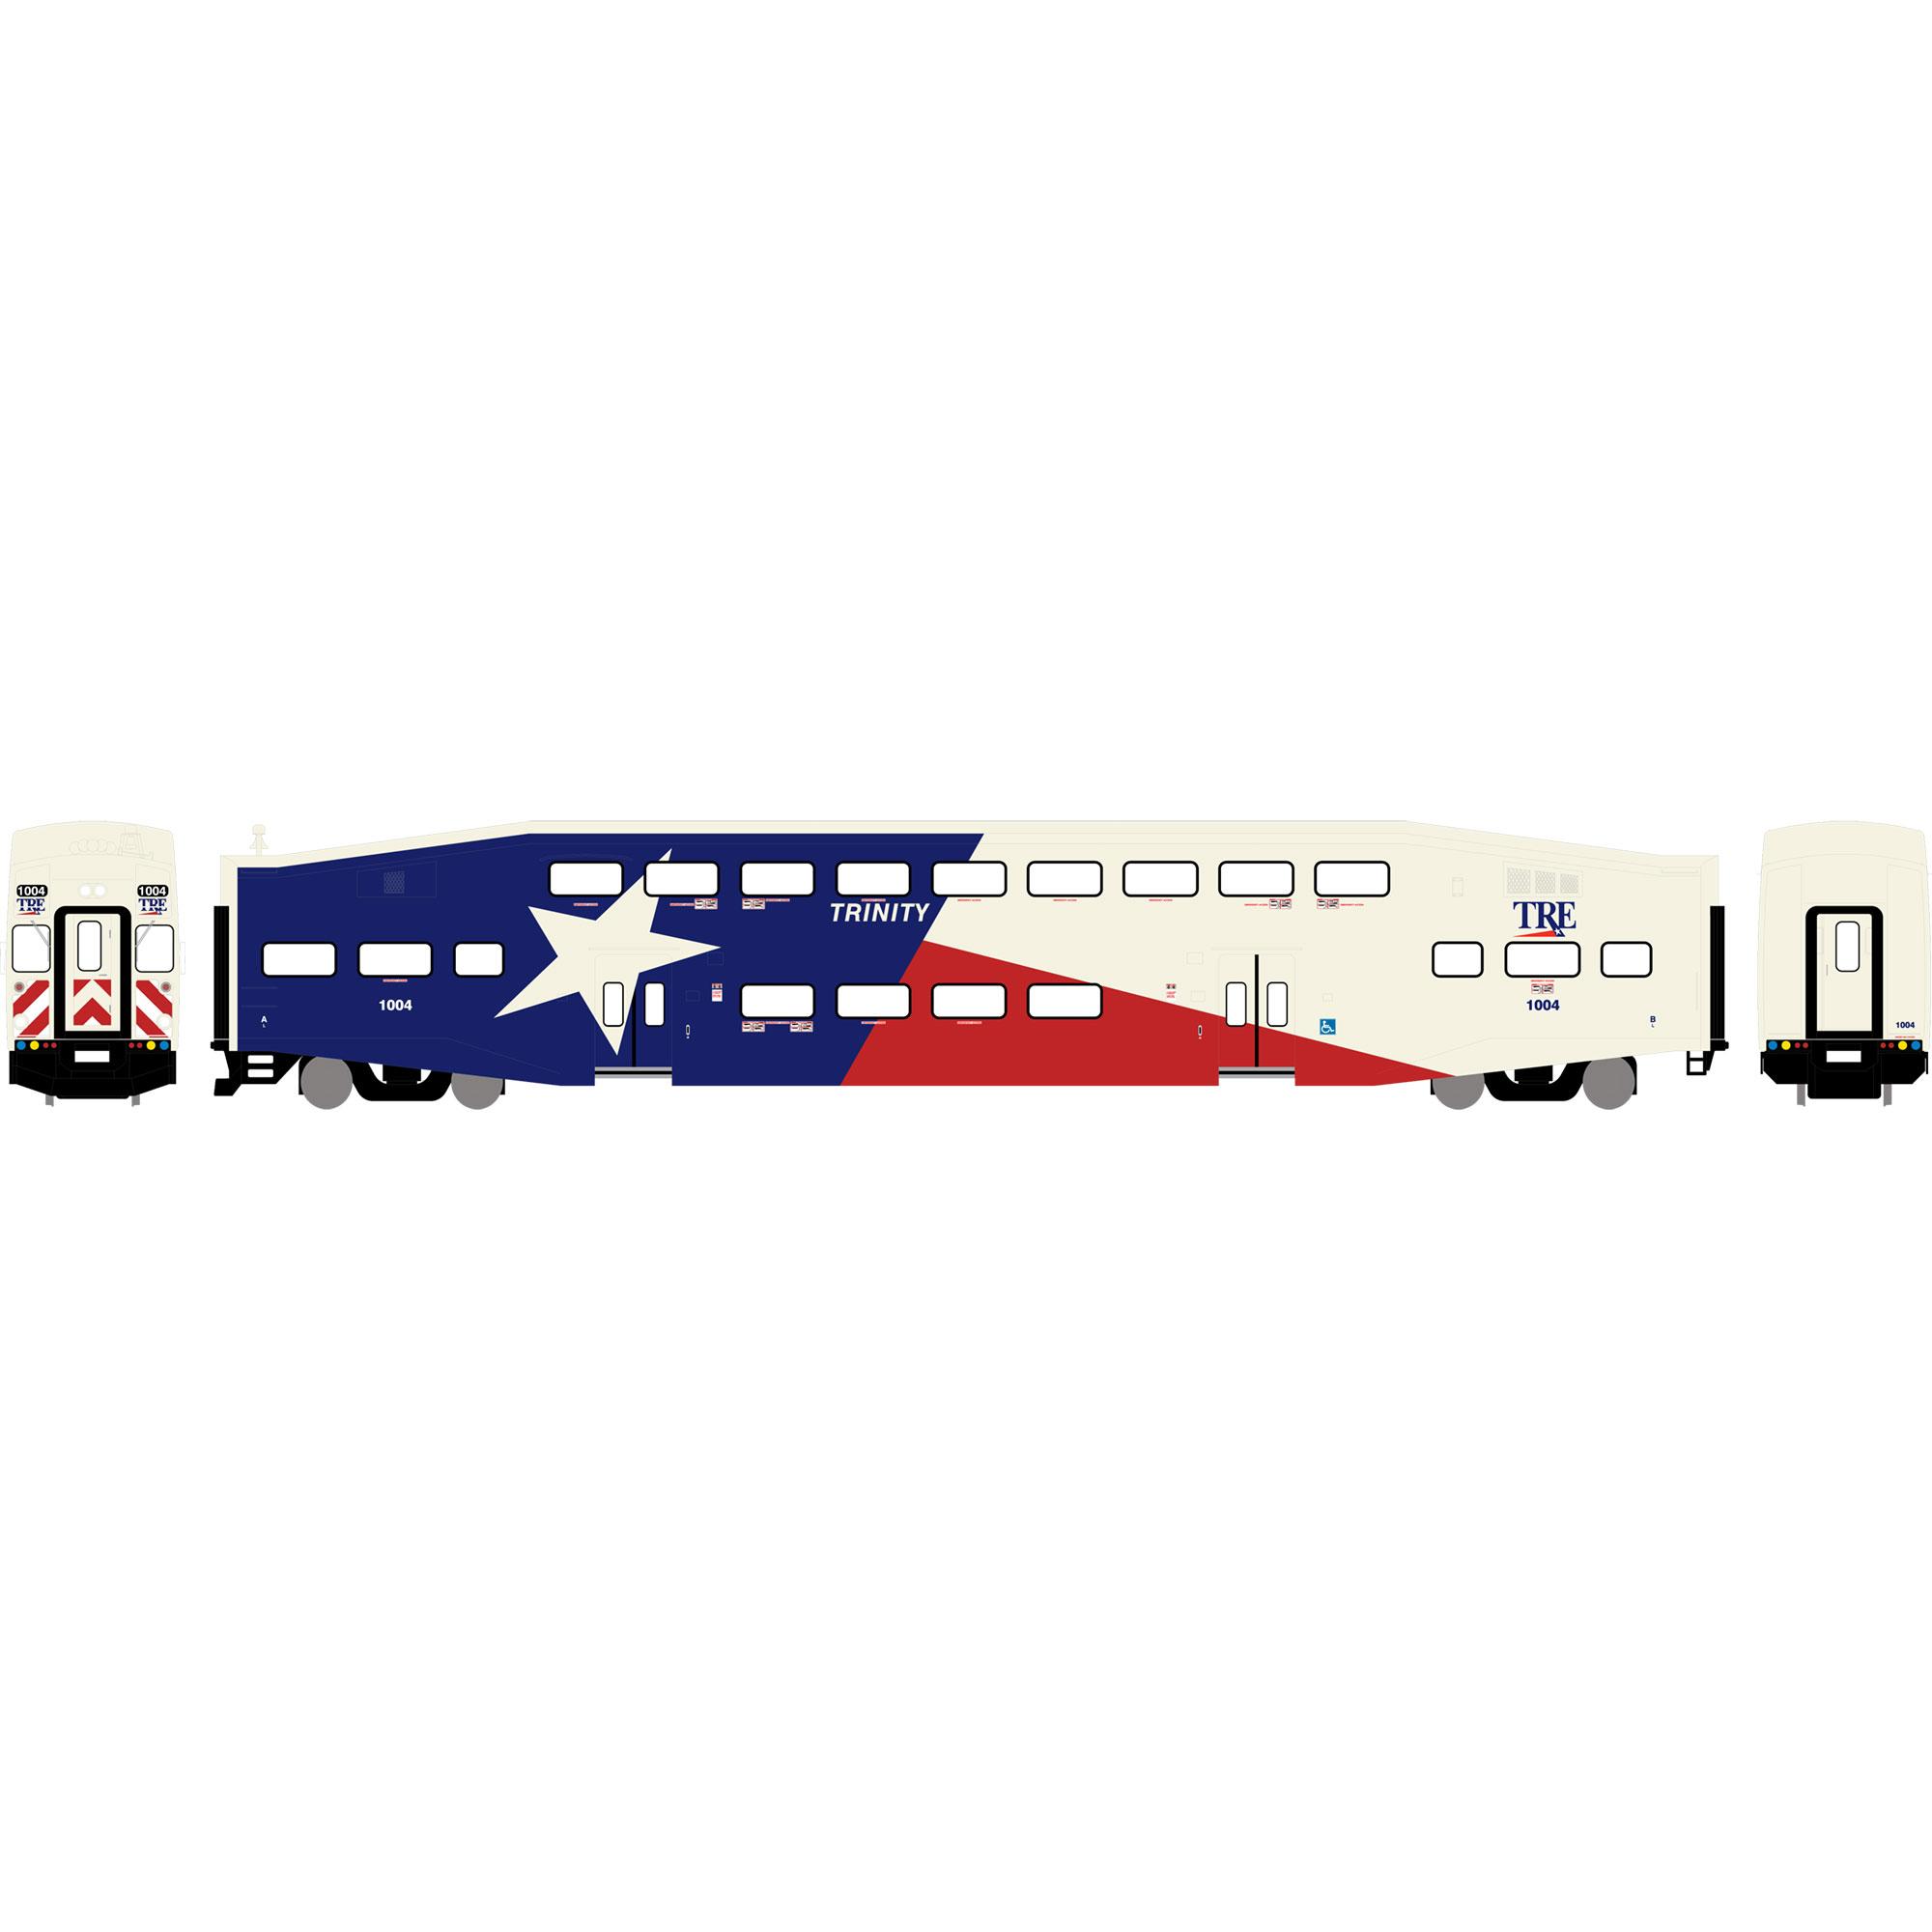 N Scale - Athearn - 24409 - Passenger Car, Commuter, Bombardier Multi-Level - Trinity Rail Express - 1004